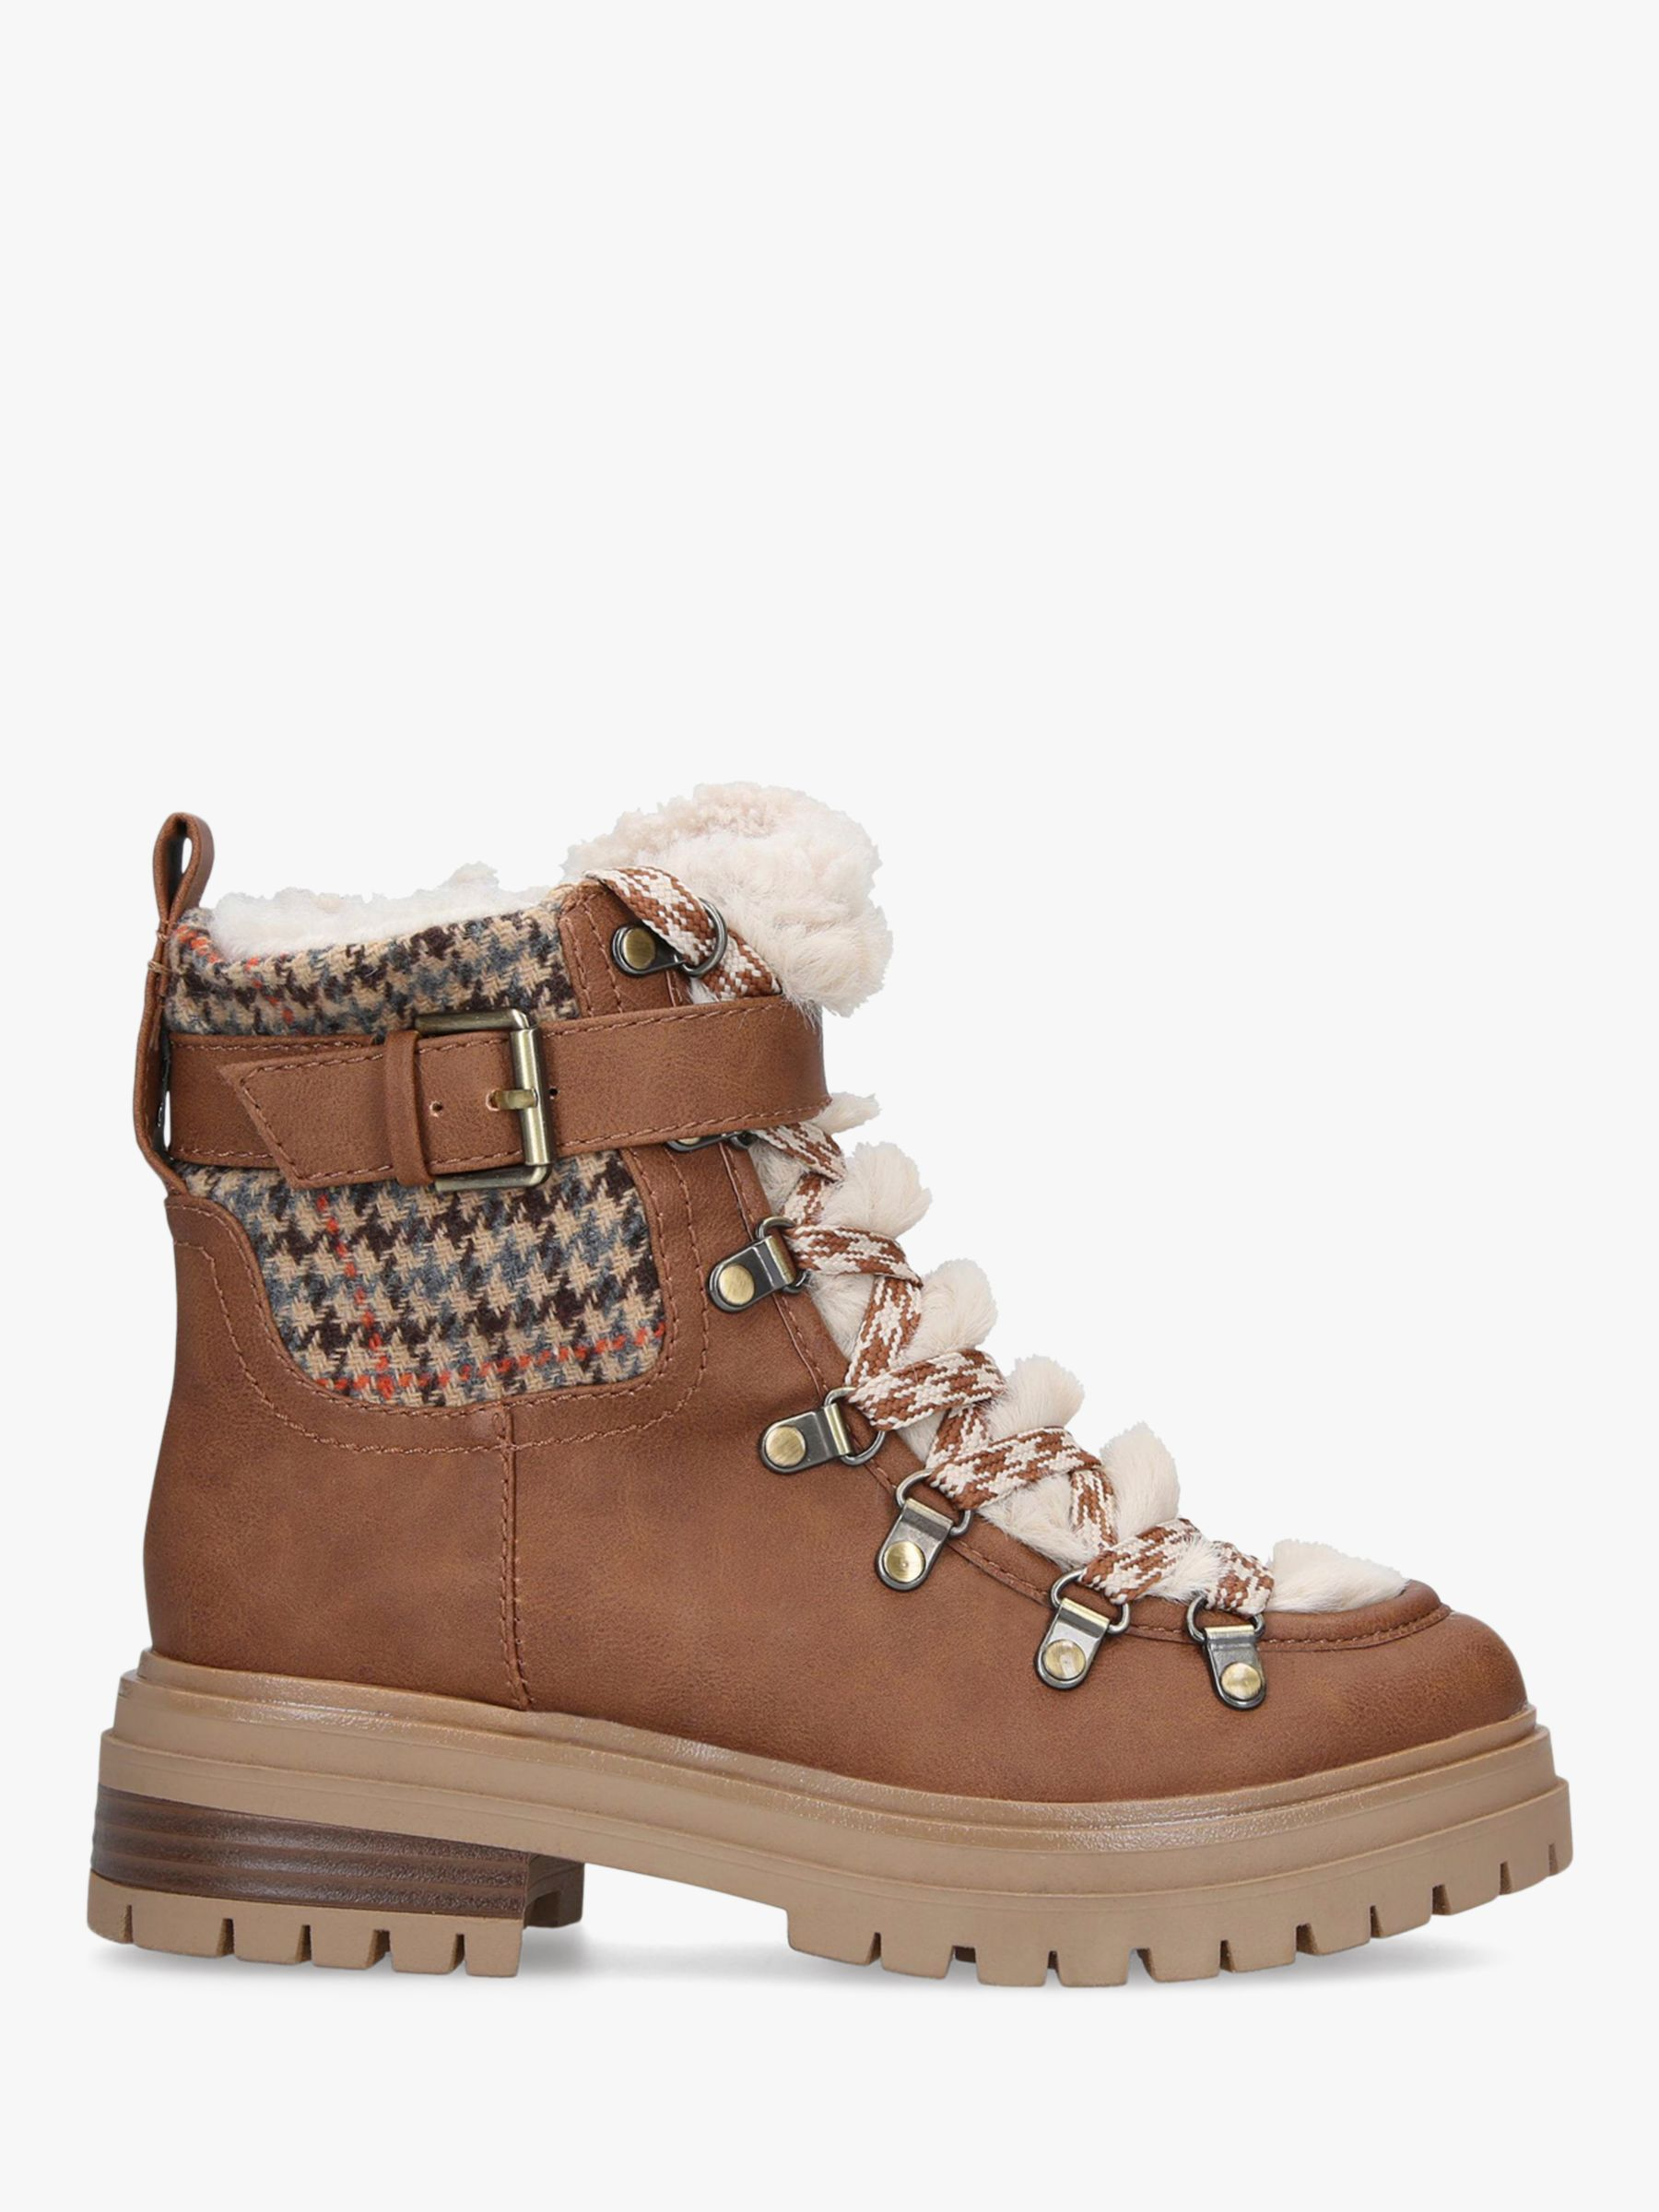 Sam Edelman Sam Edelman Gretchen Leather Ankle Boots